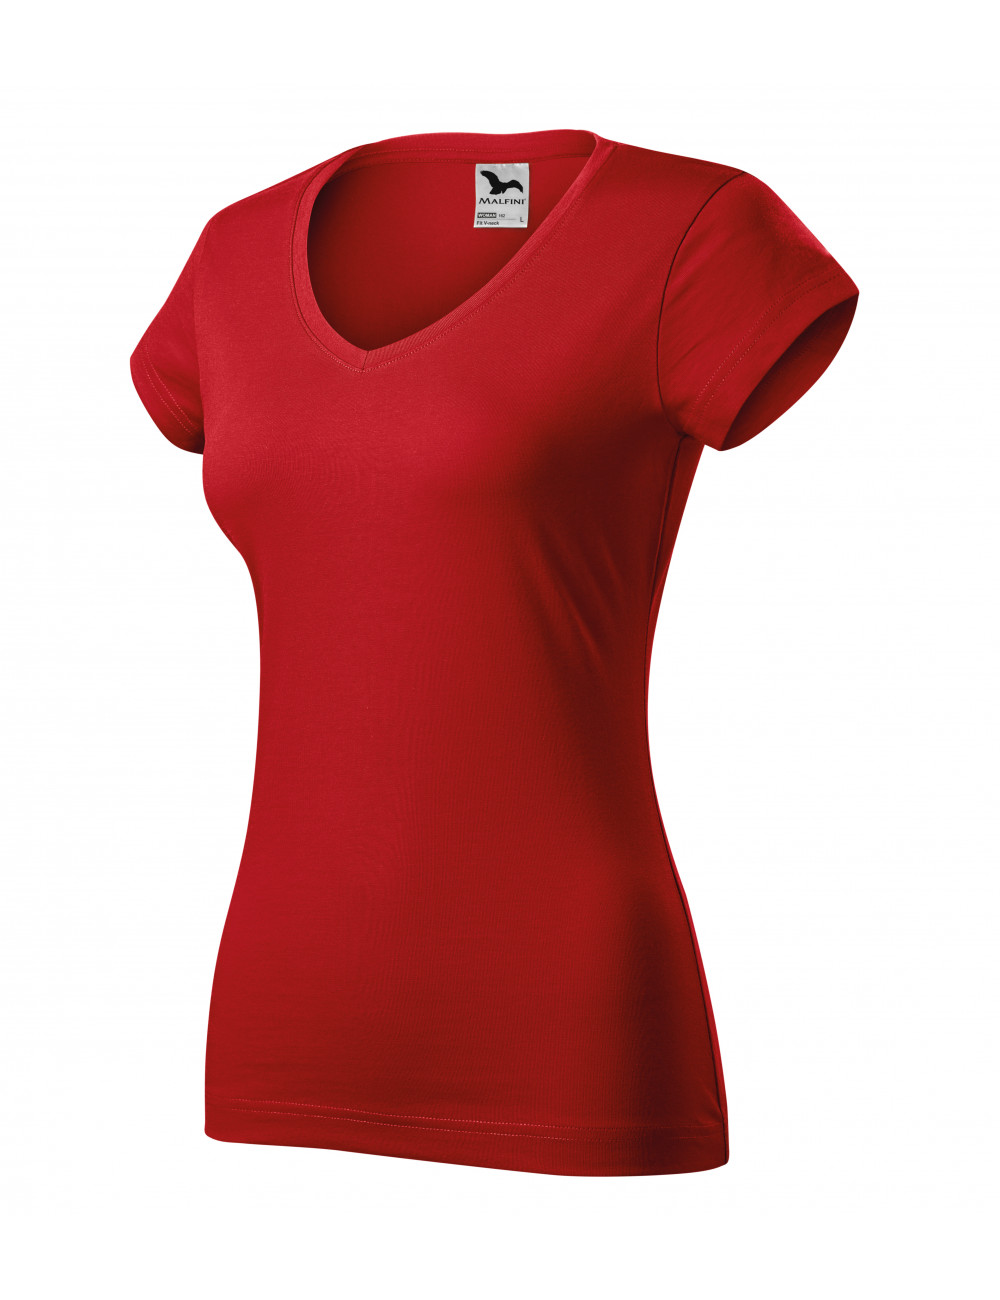 Adler MALFINI Koszulka damska Fit V-neck 162 czerwony